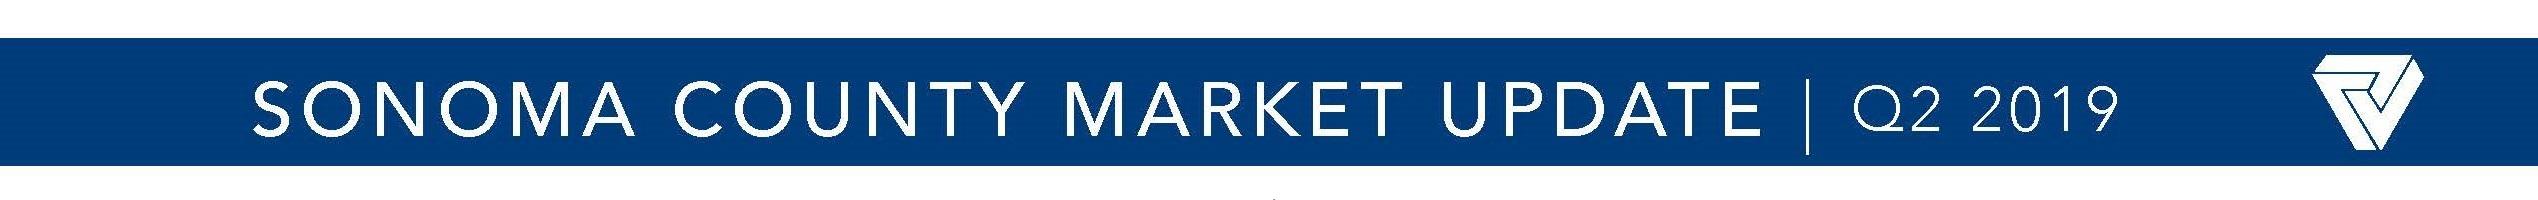 Sonoma County Market Update 8/23/19